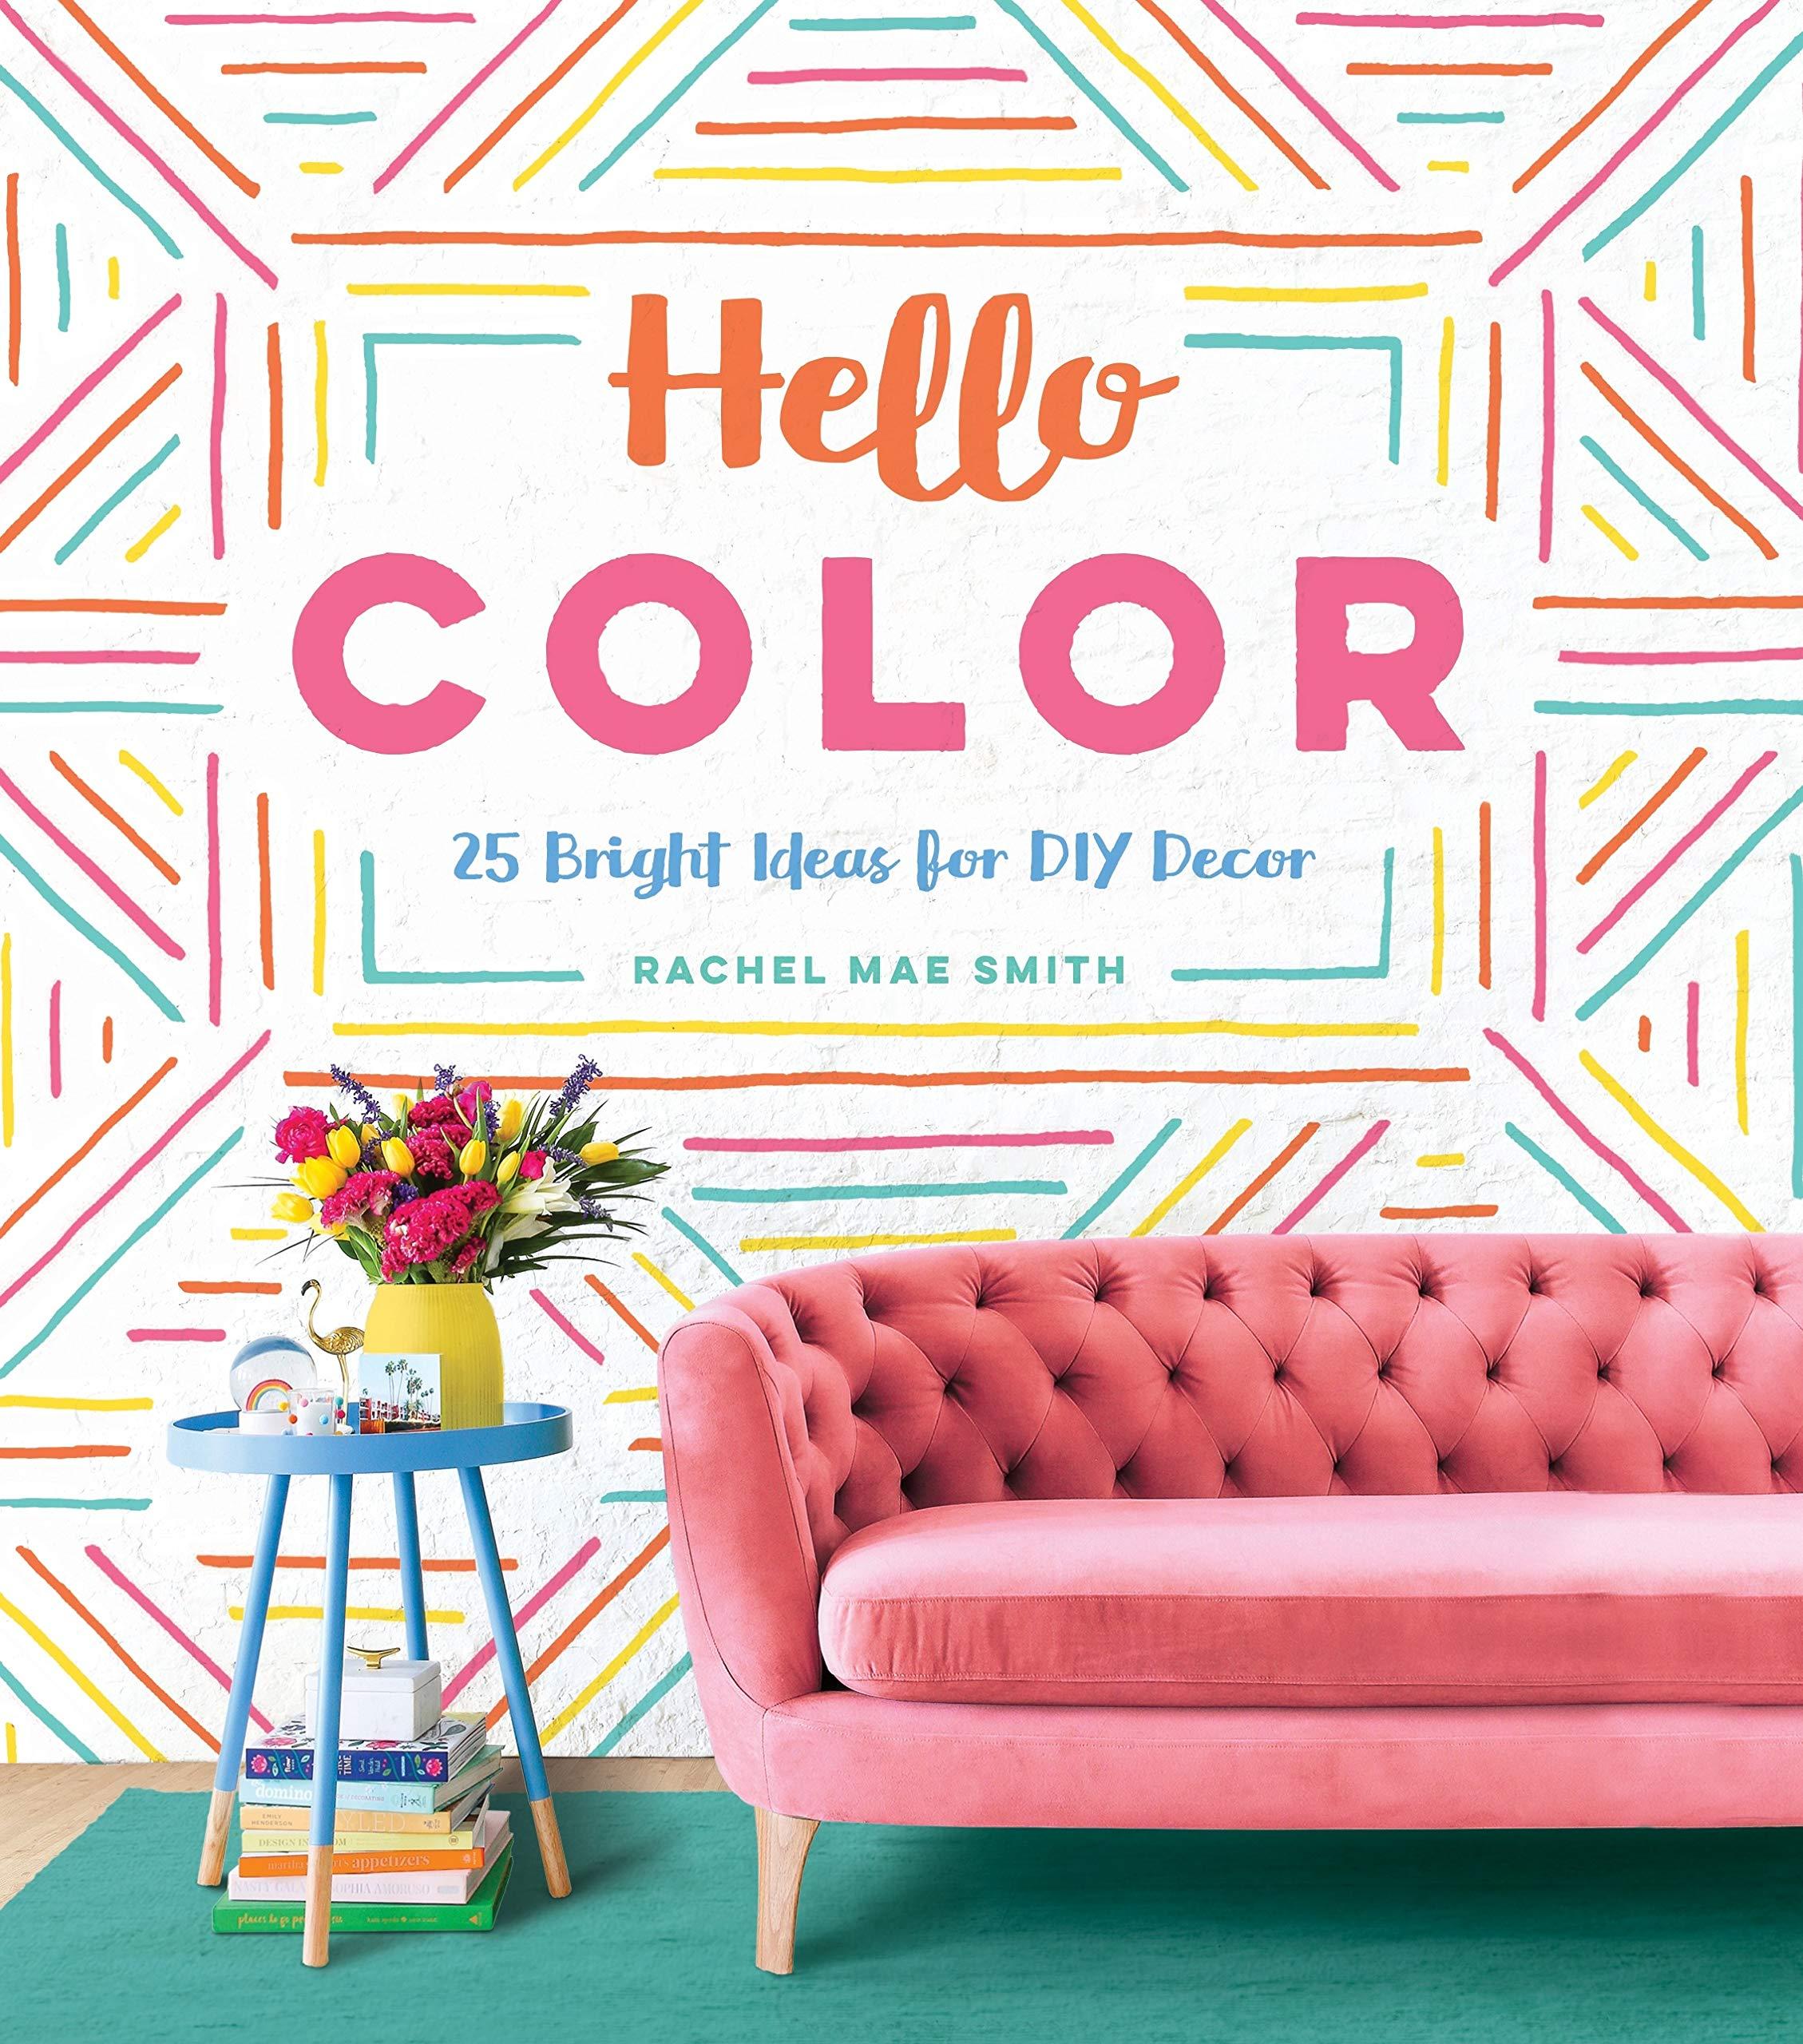 Hello Color 25 Bright Ideas For DIY Decor Rachel Mae Smith